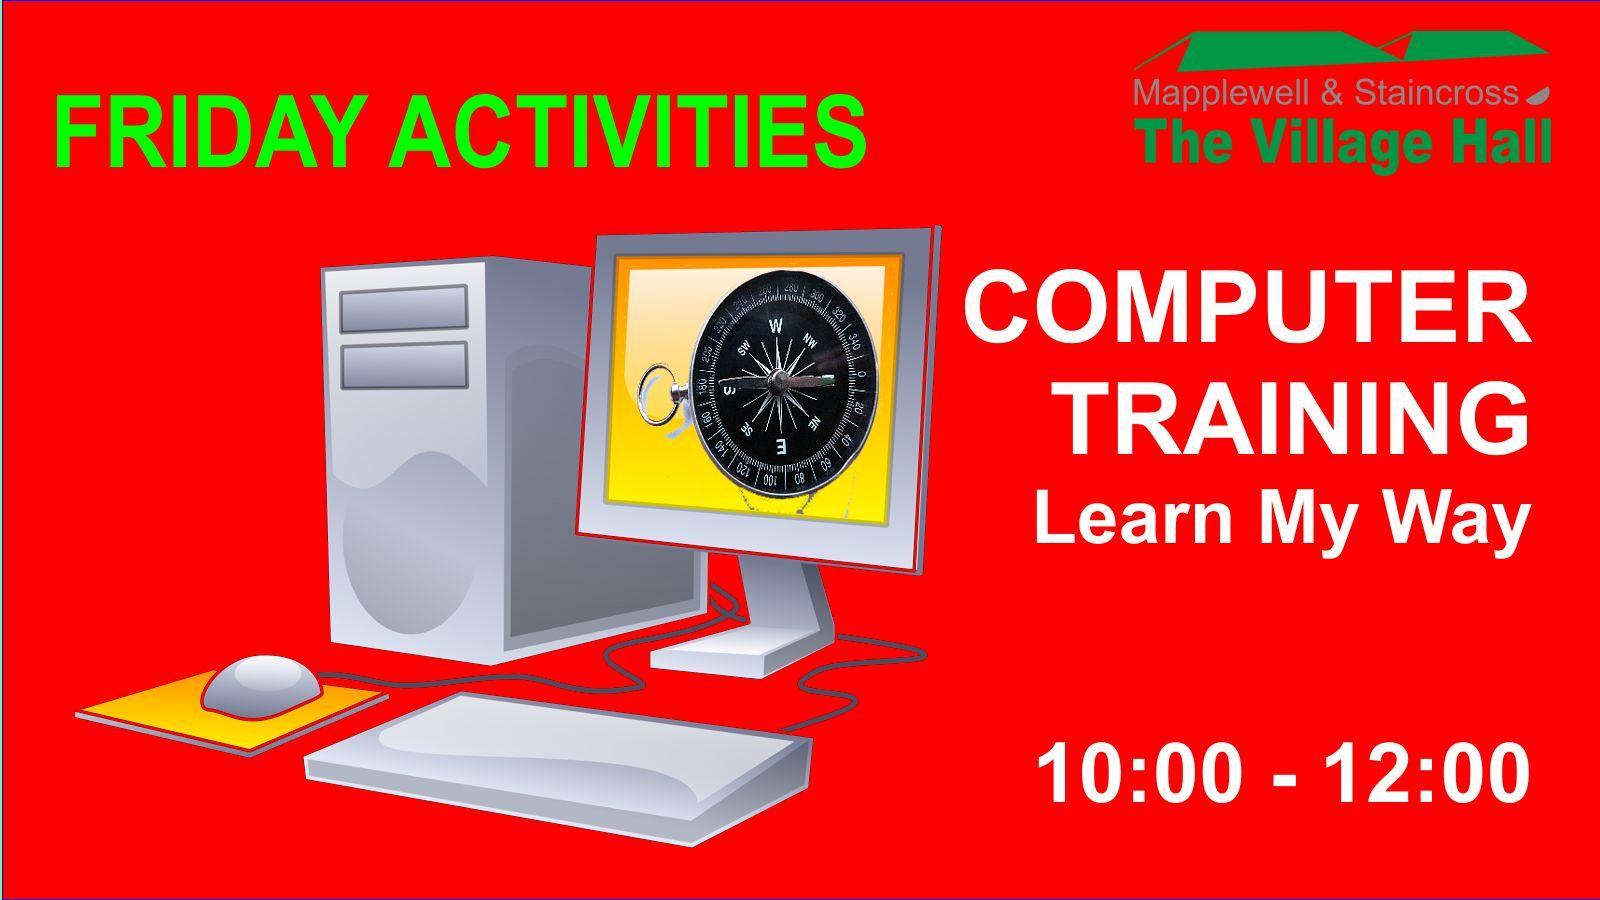 (C) Nick Hibberd Computer Training